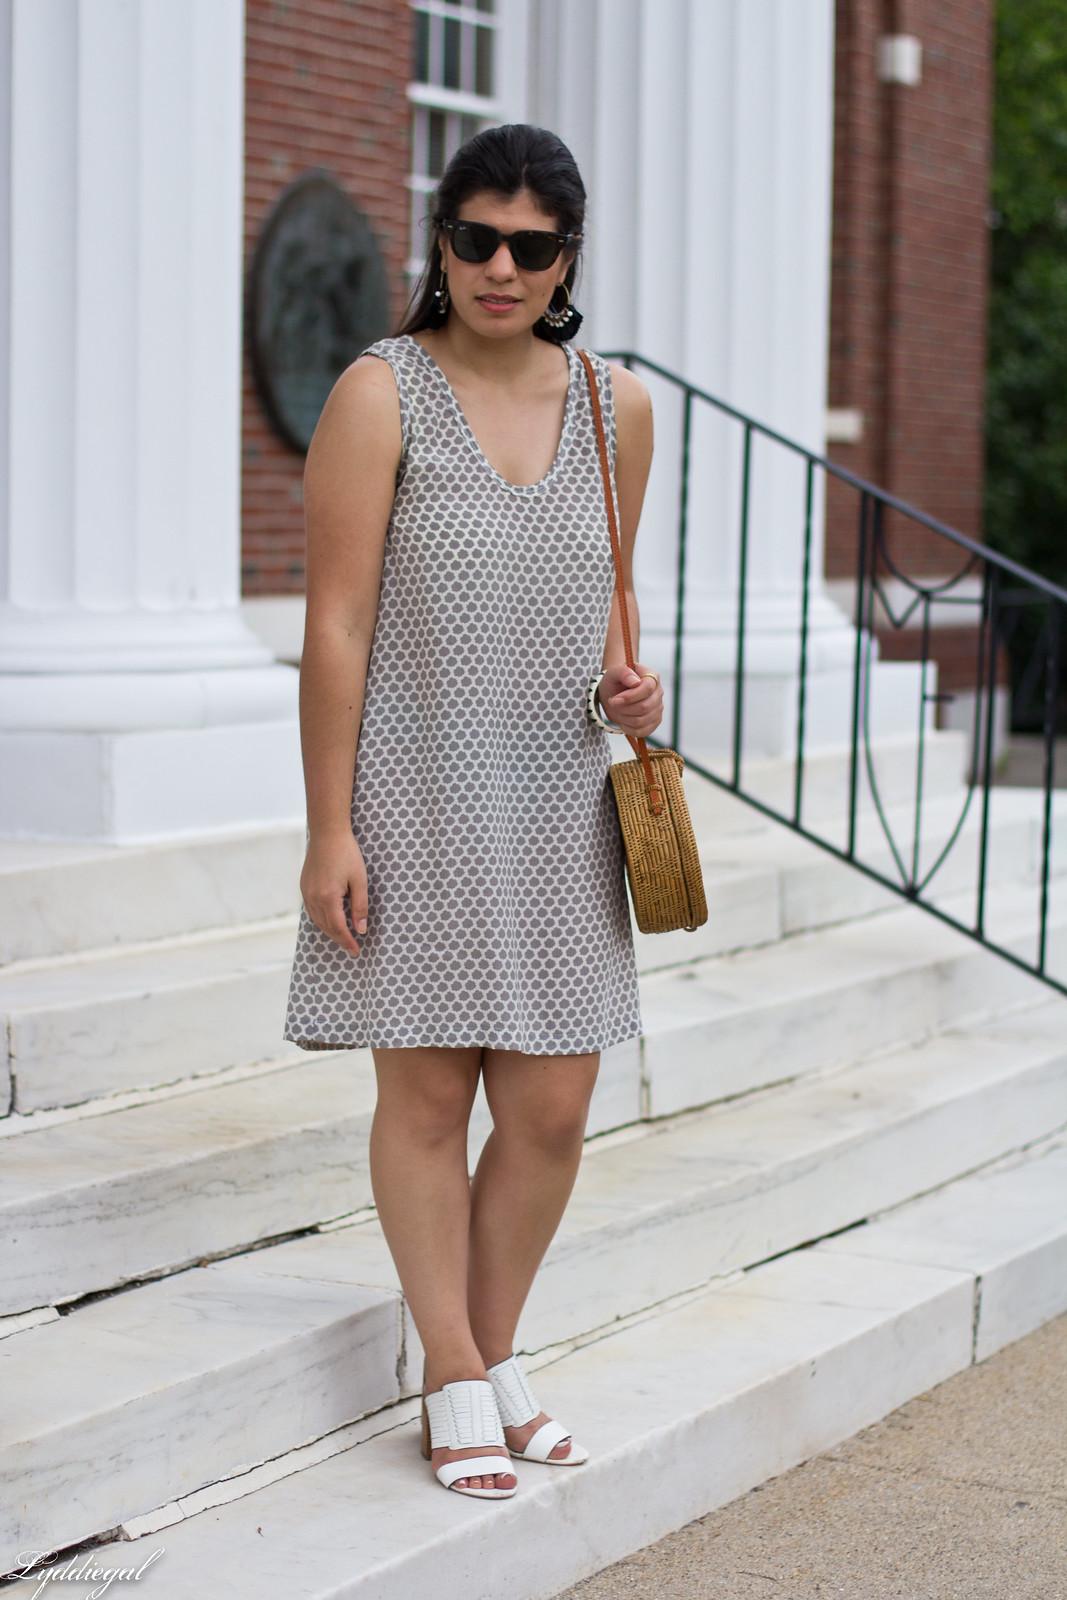 joie cloudburst dress, round straw bag, statement earrings-1.jpg